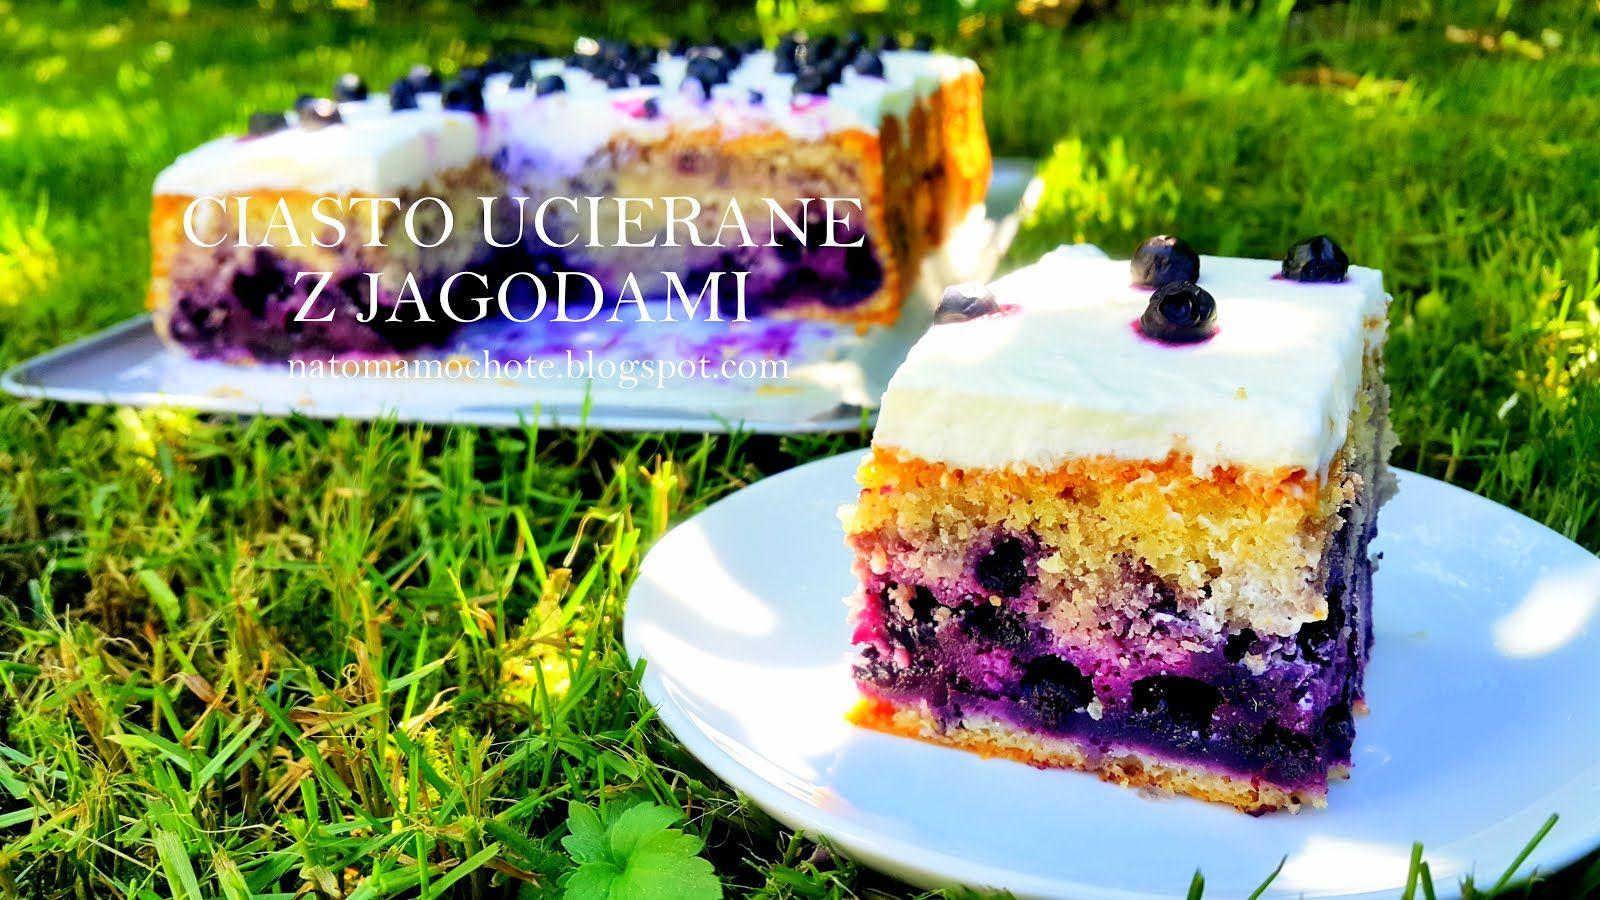 Ucierane Ciasto Z Jagodami I Bita Smietana Ciasta Cake Desserts